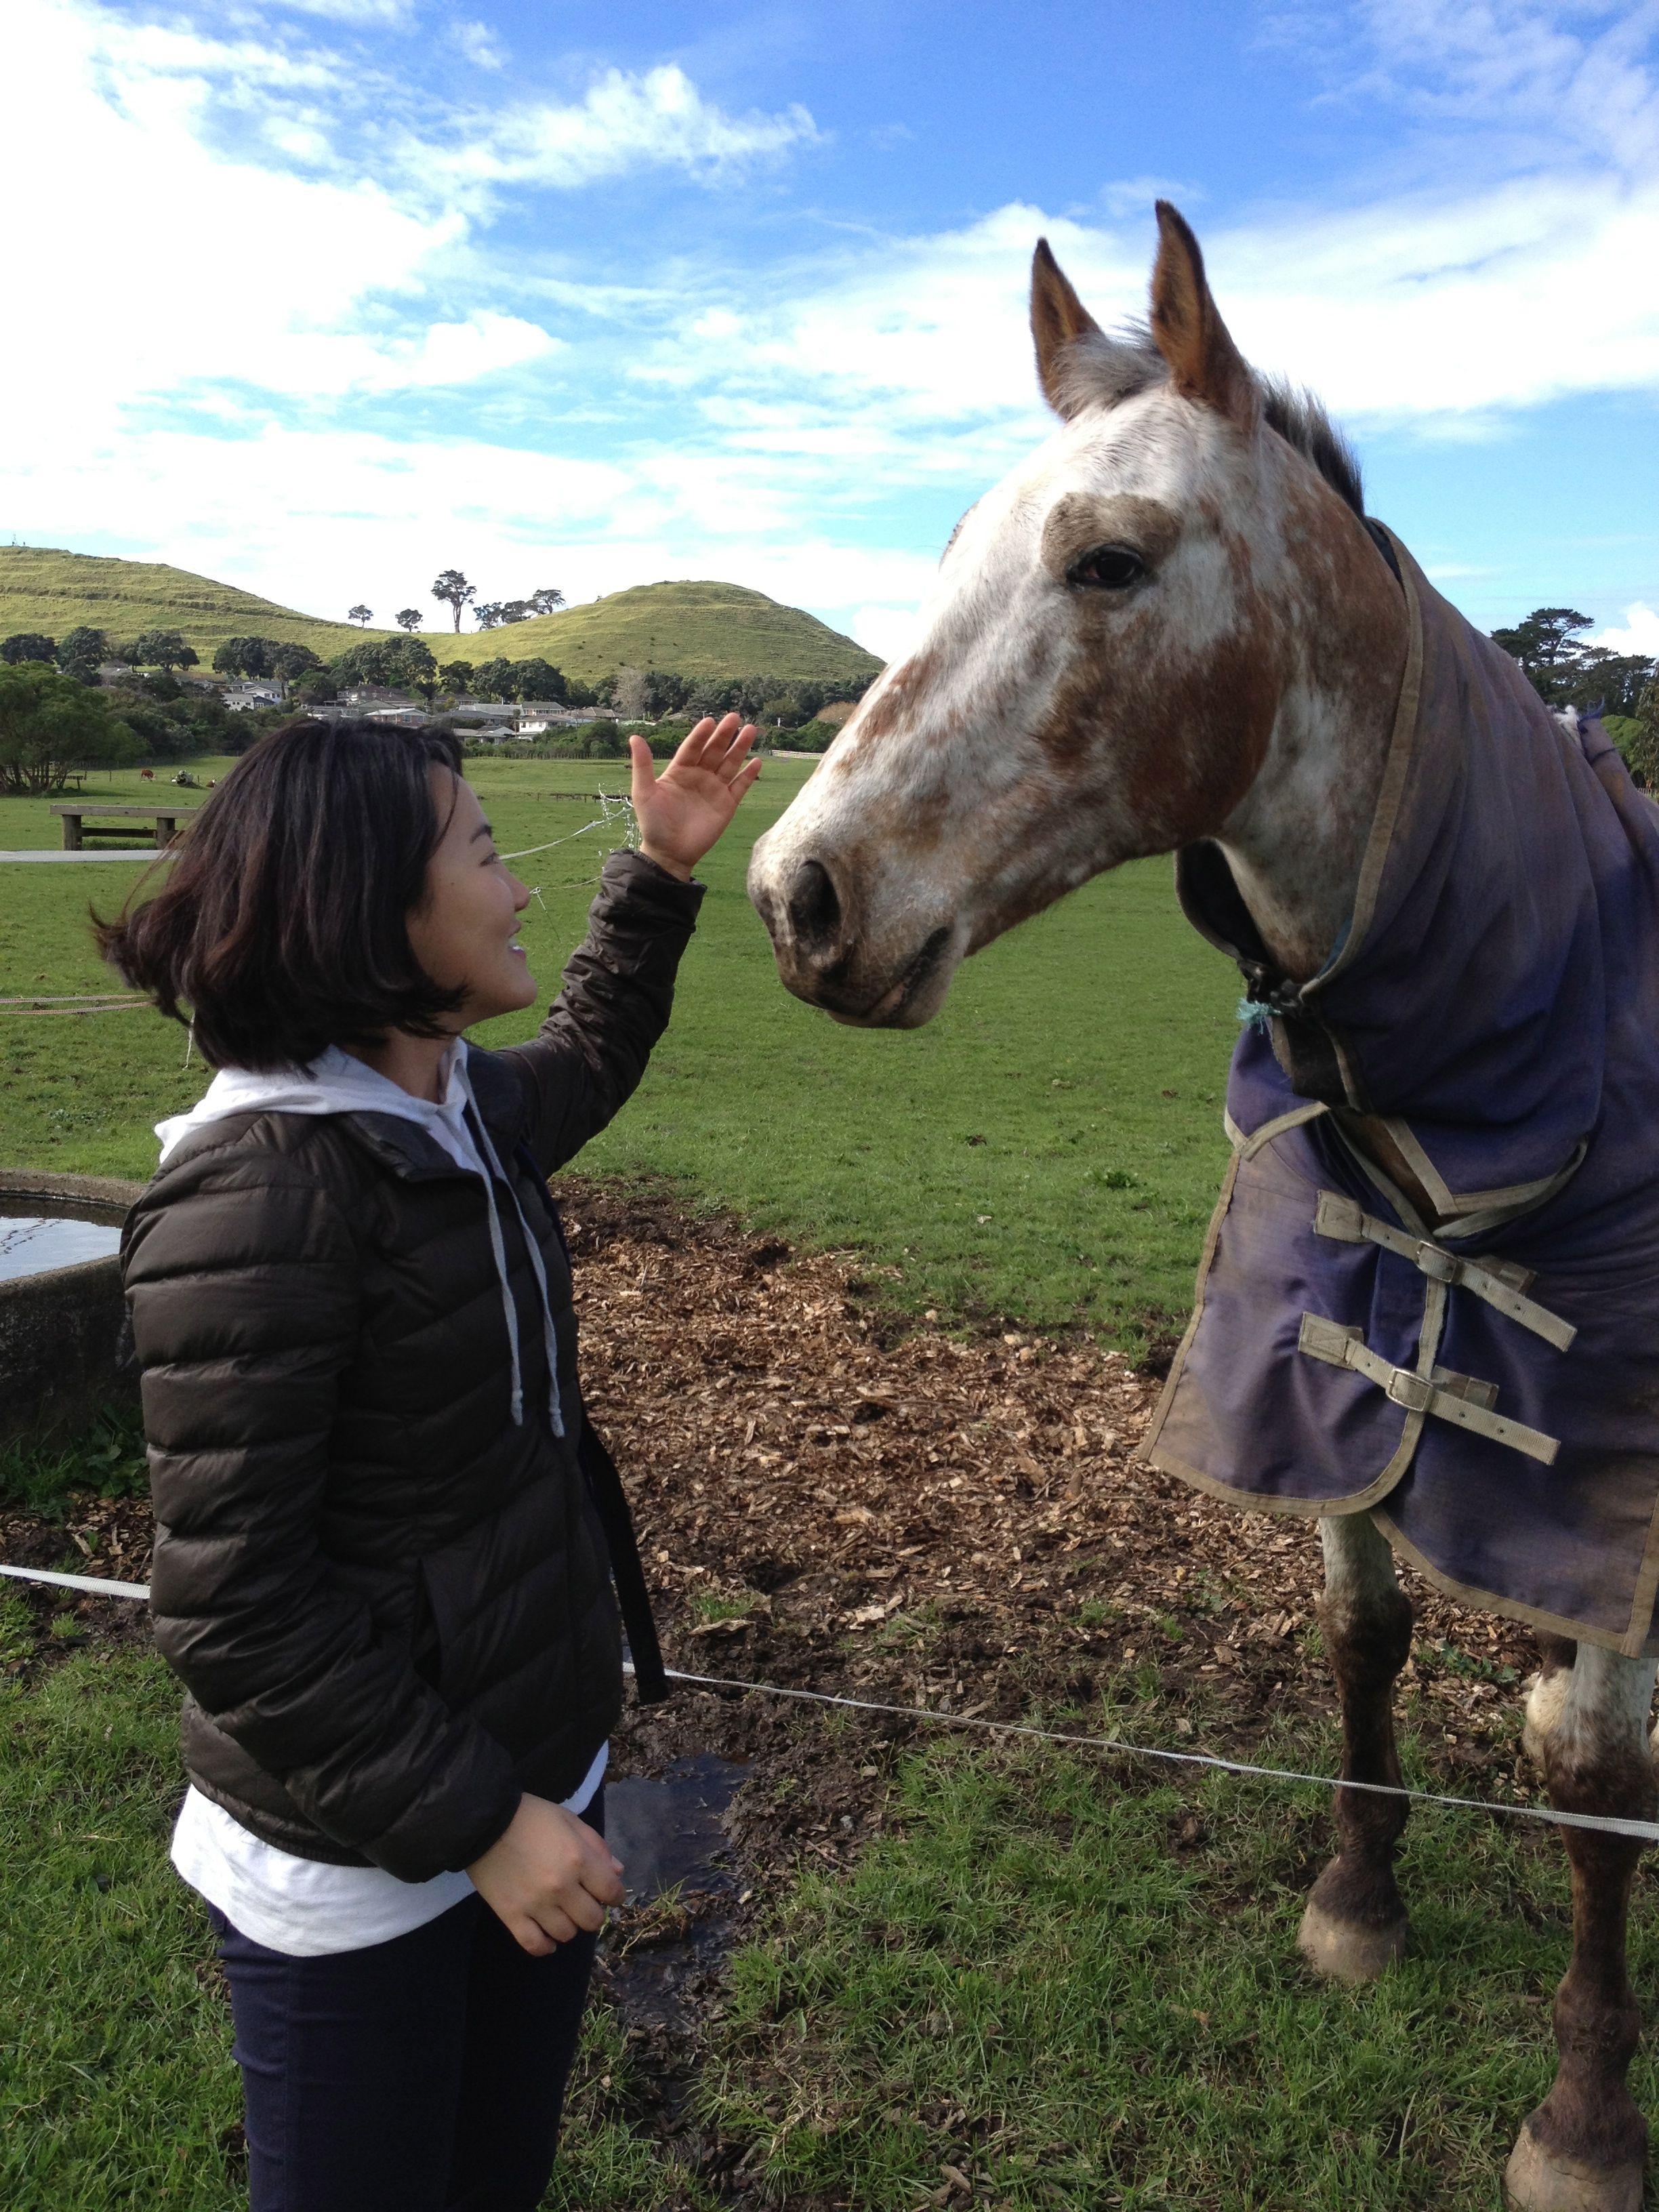 Friendly Horse at Ambury Park